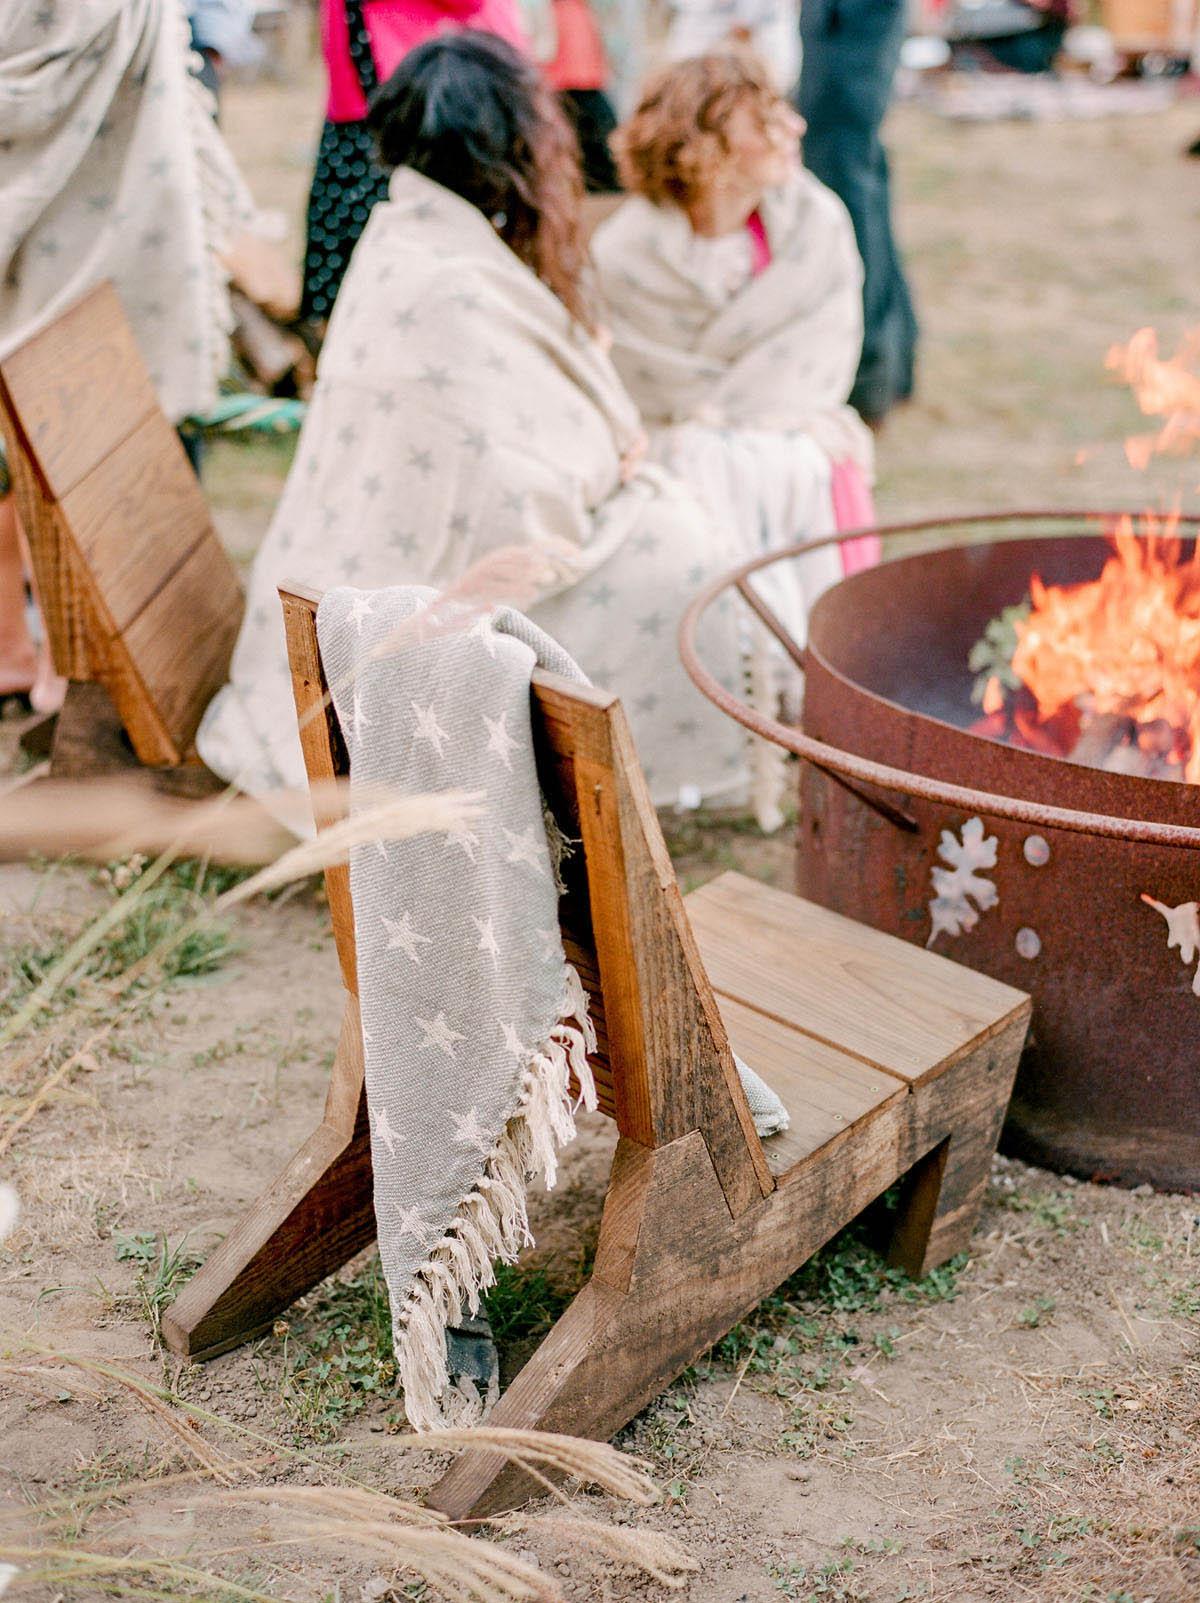 19-cozy-wedding-details-bonfire.jpg